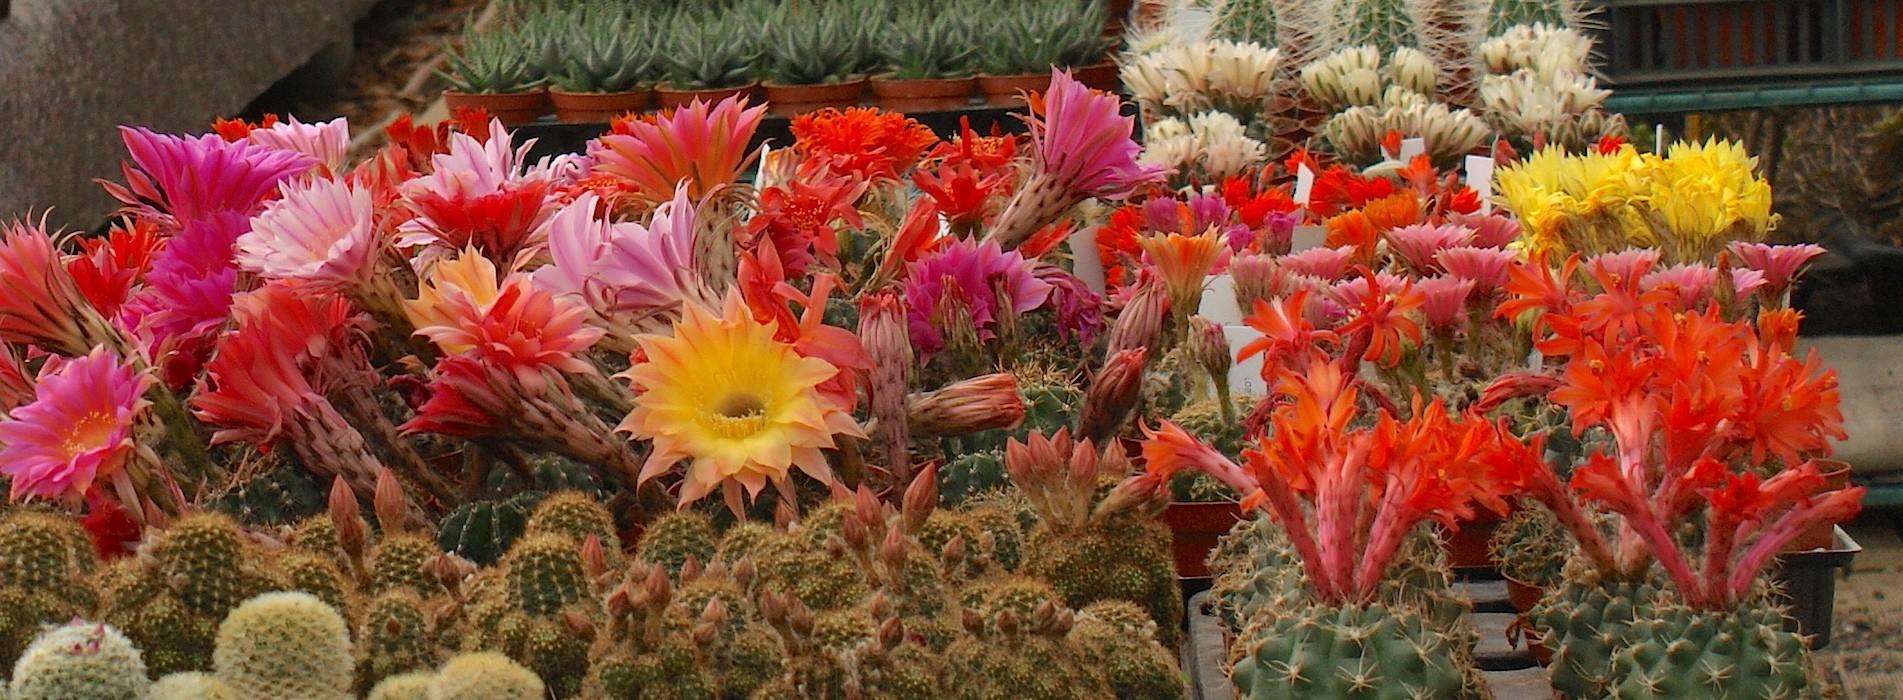 Le Cactus Alpin - Echinopsis